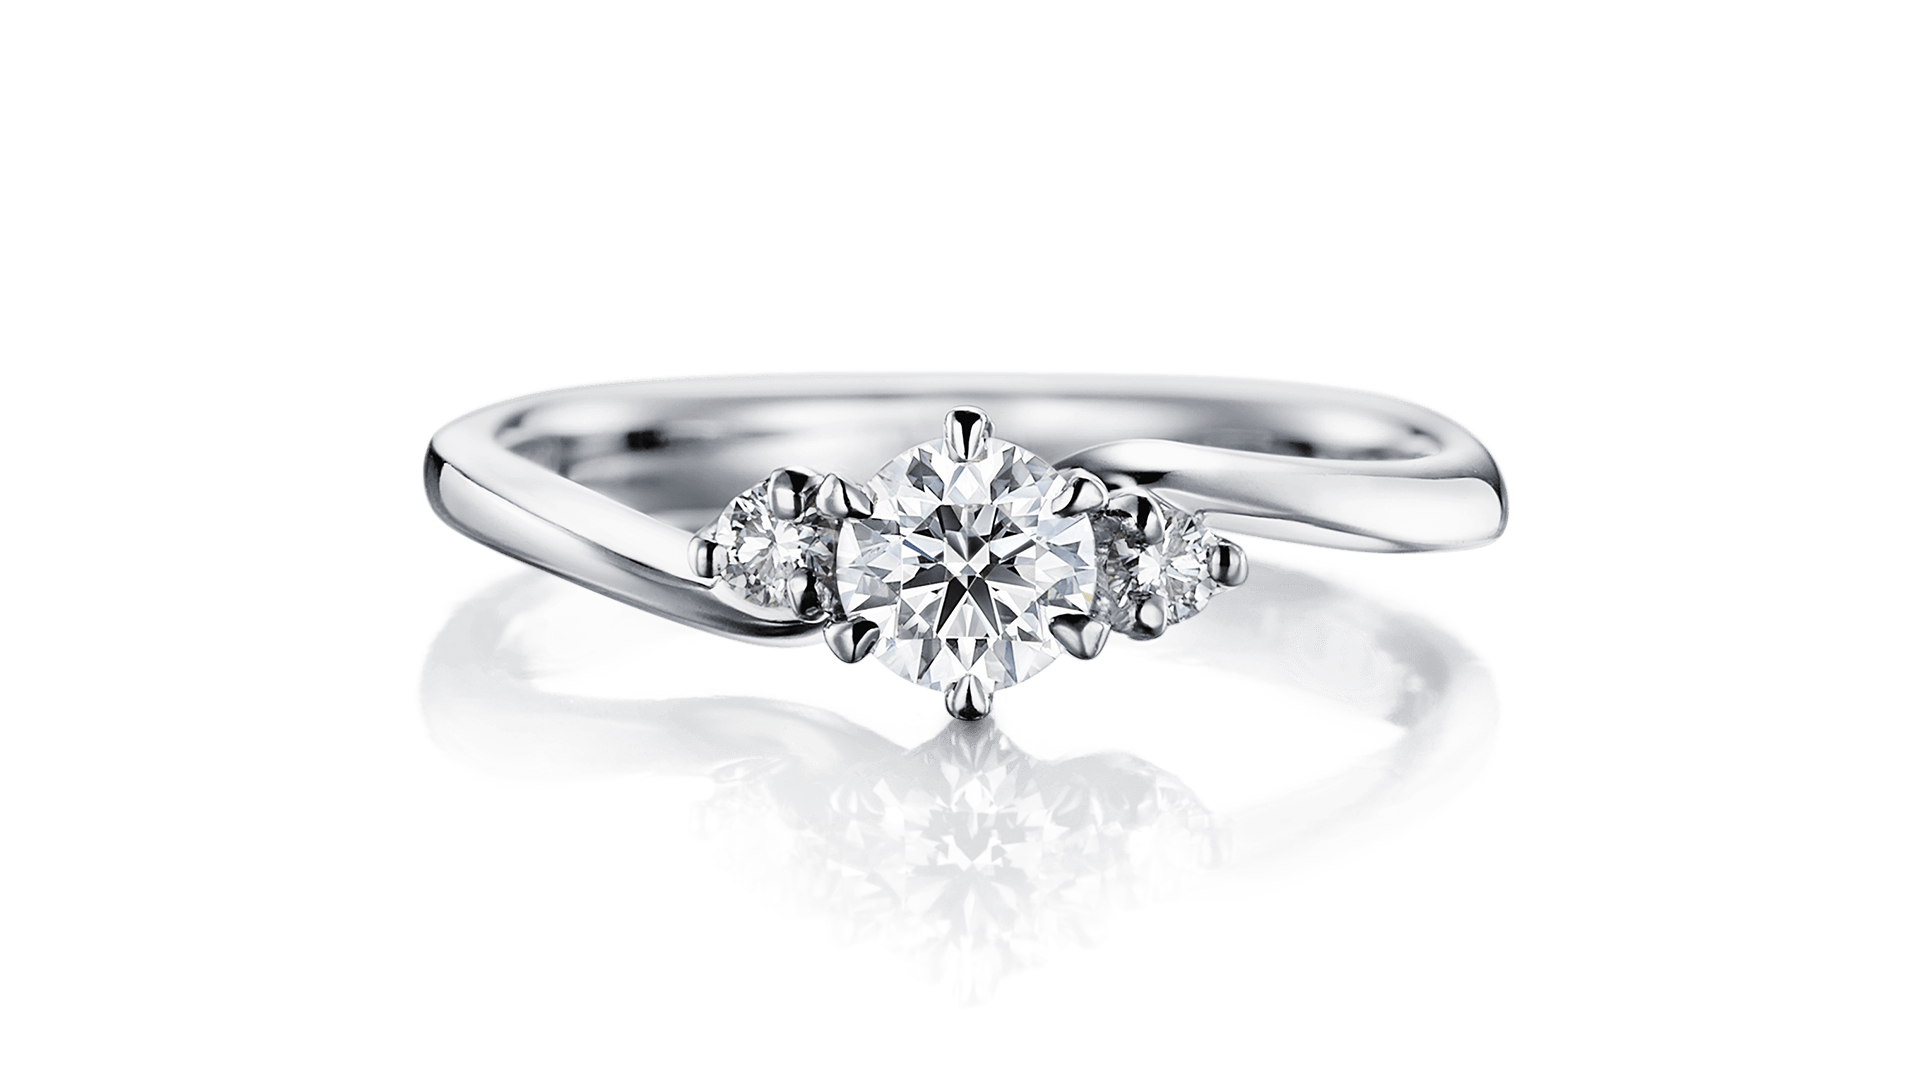 shelia シェリア | 婚約指輪サムネイル 1